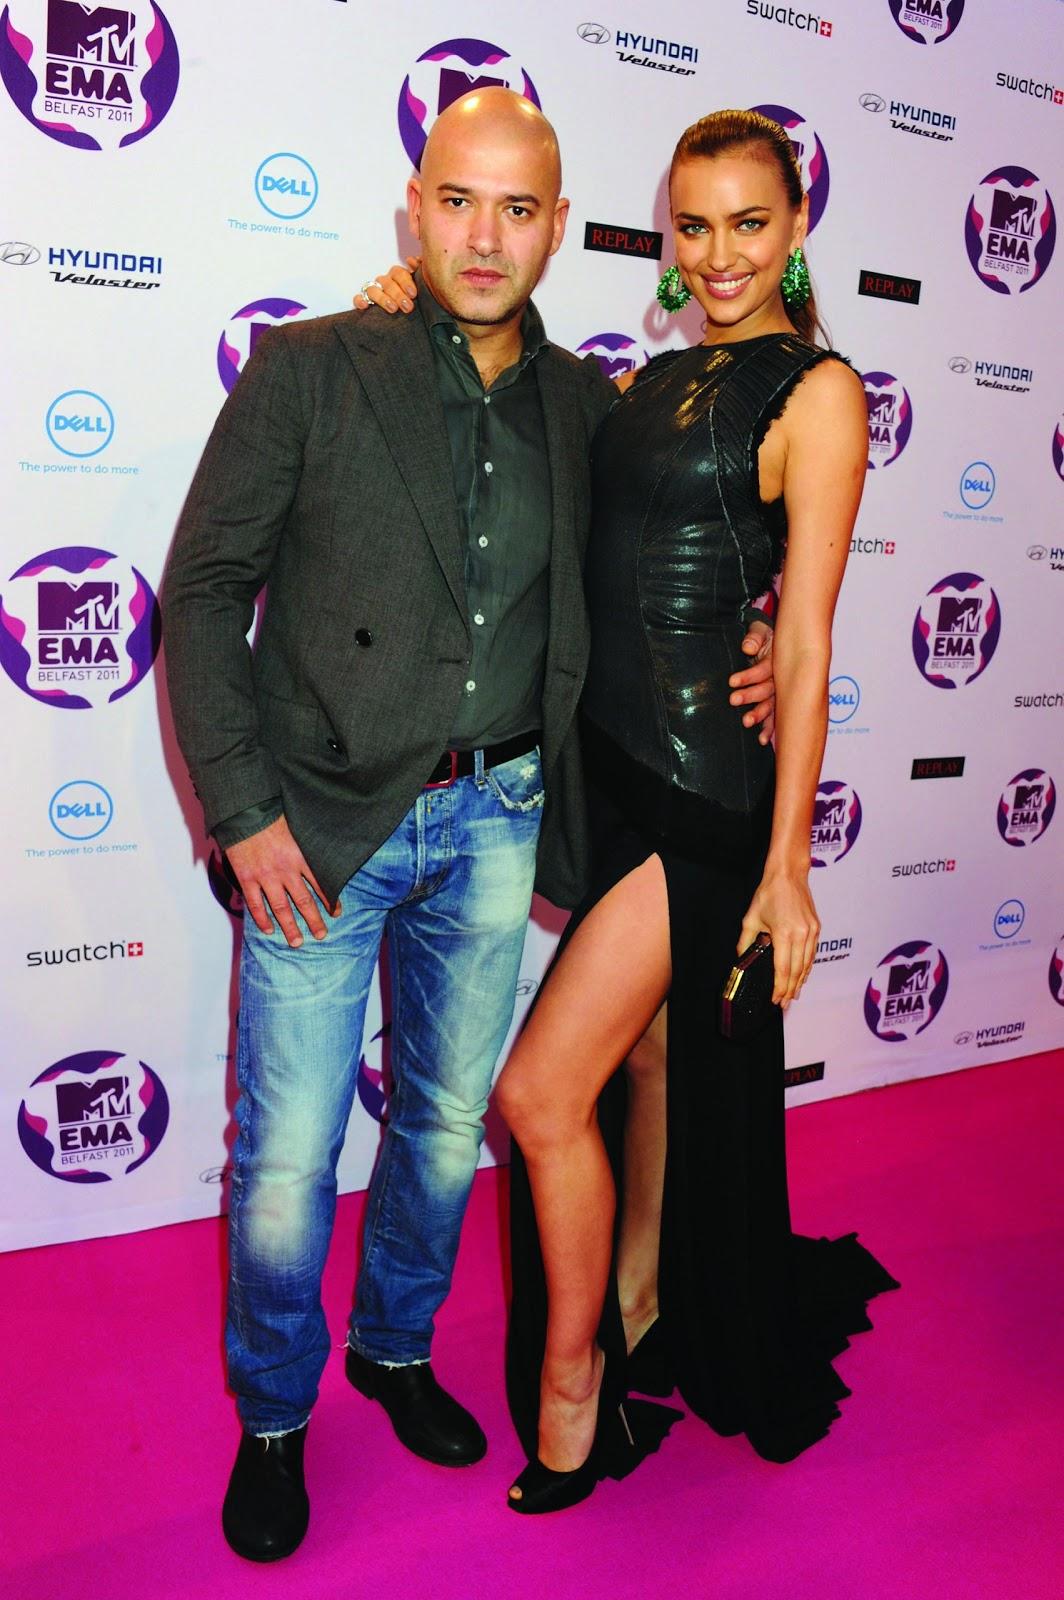 http://3.bp.blogspot.com/-OmJtUKz7fRI/TsKQ9jxp3OI/AAAAAAAAA_g/qX6lbsS6bw0/s1600/Irina+Shayk+-+Replay+nos+MTV+Awards+2011.jpg